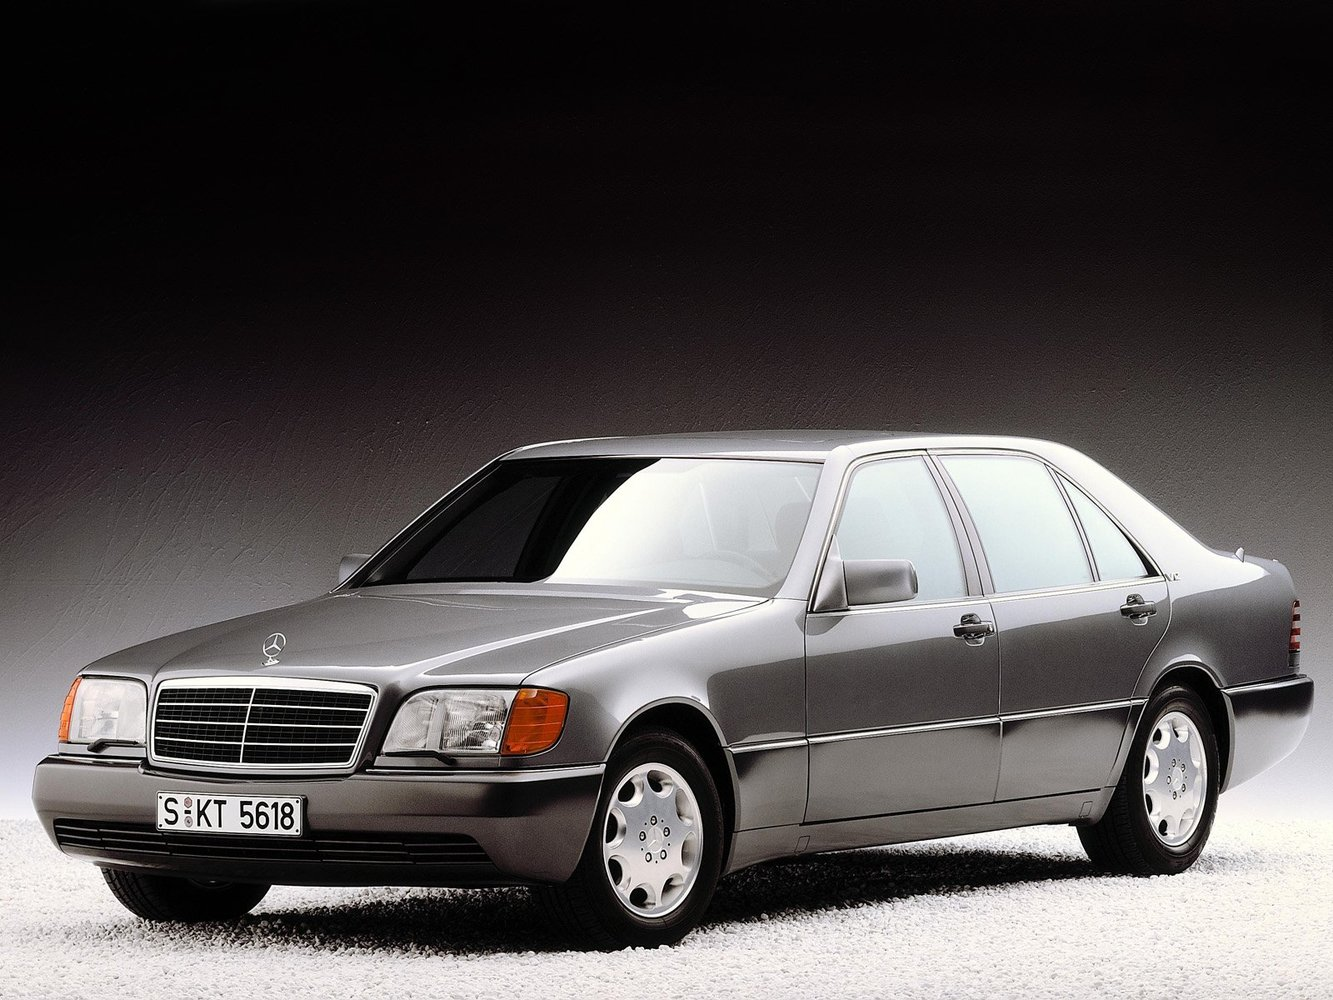 седан Long Mercedes-Benz S-klasse